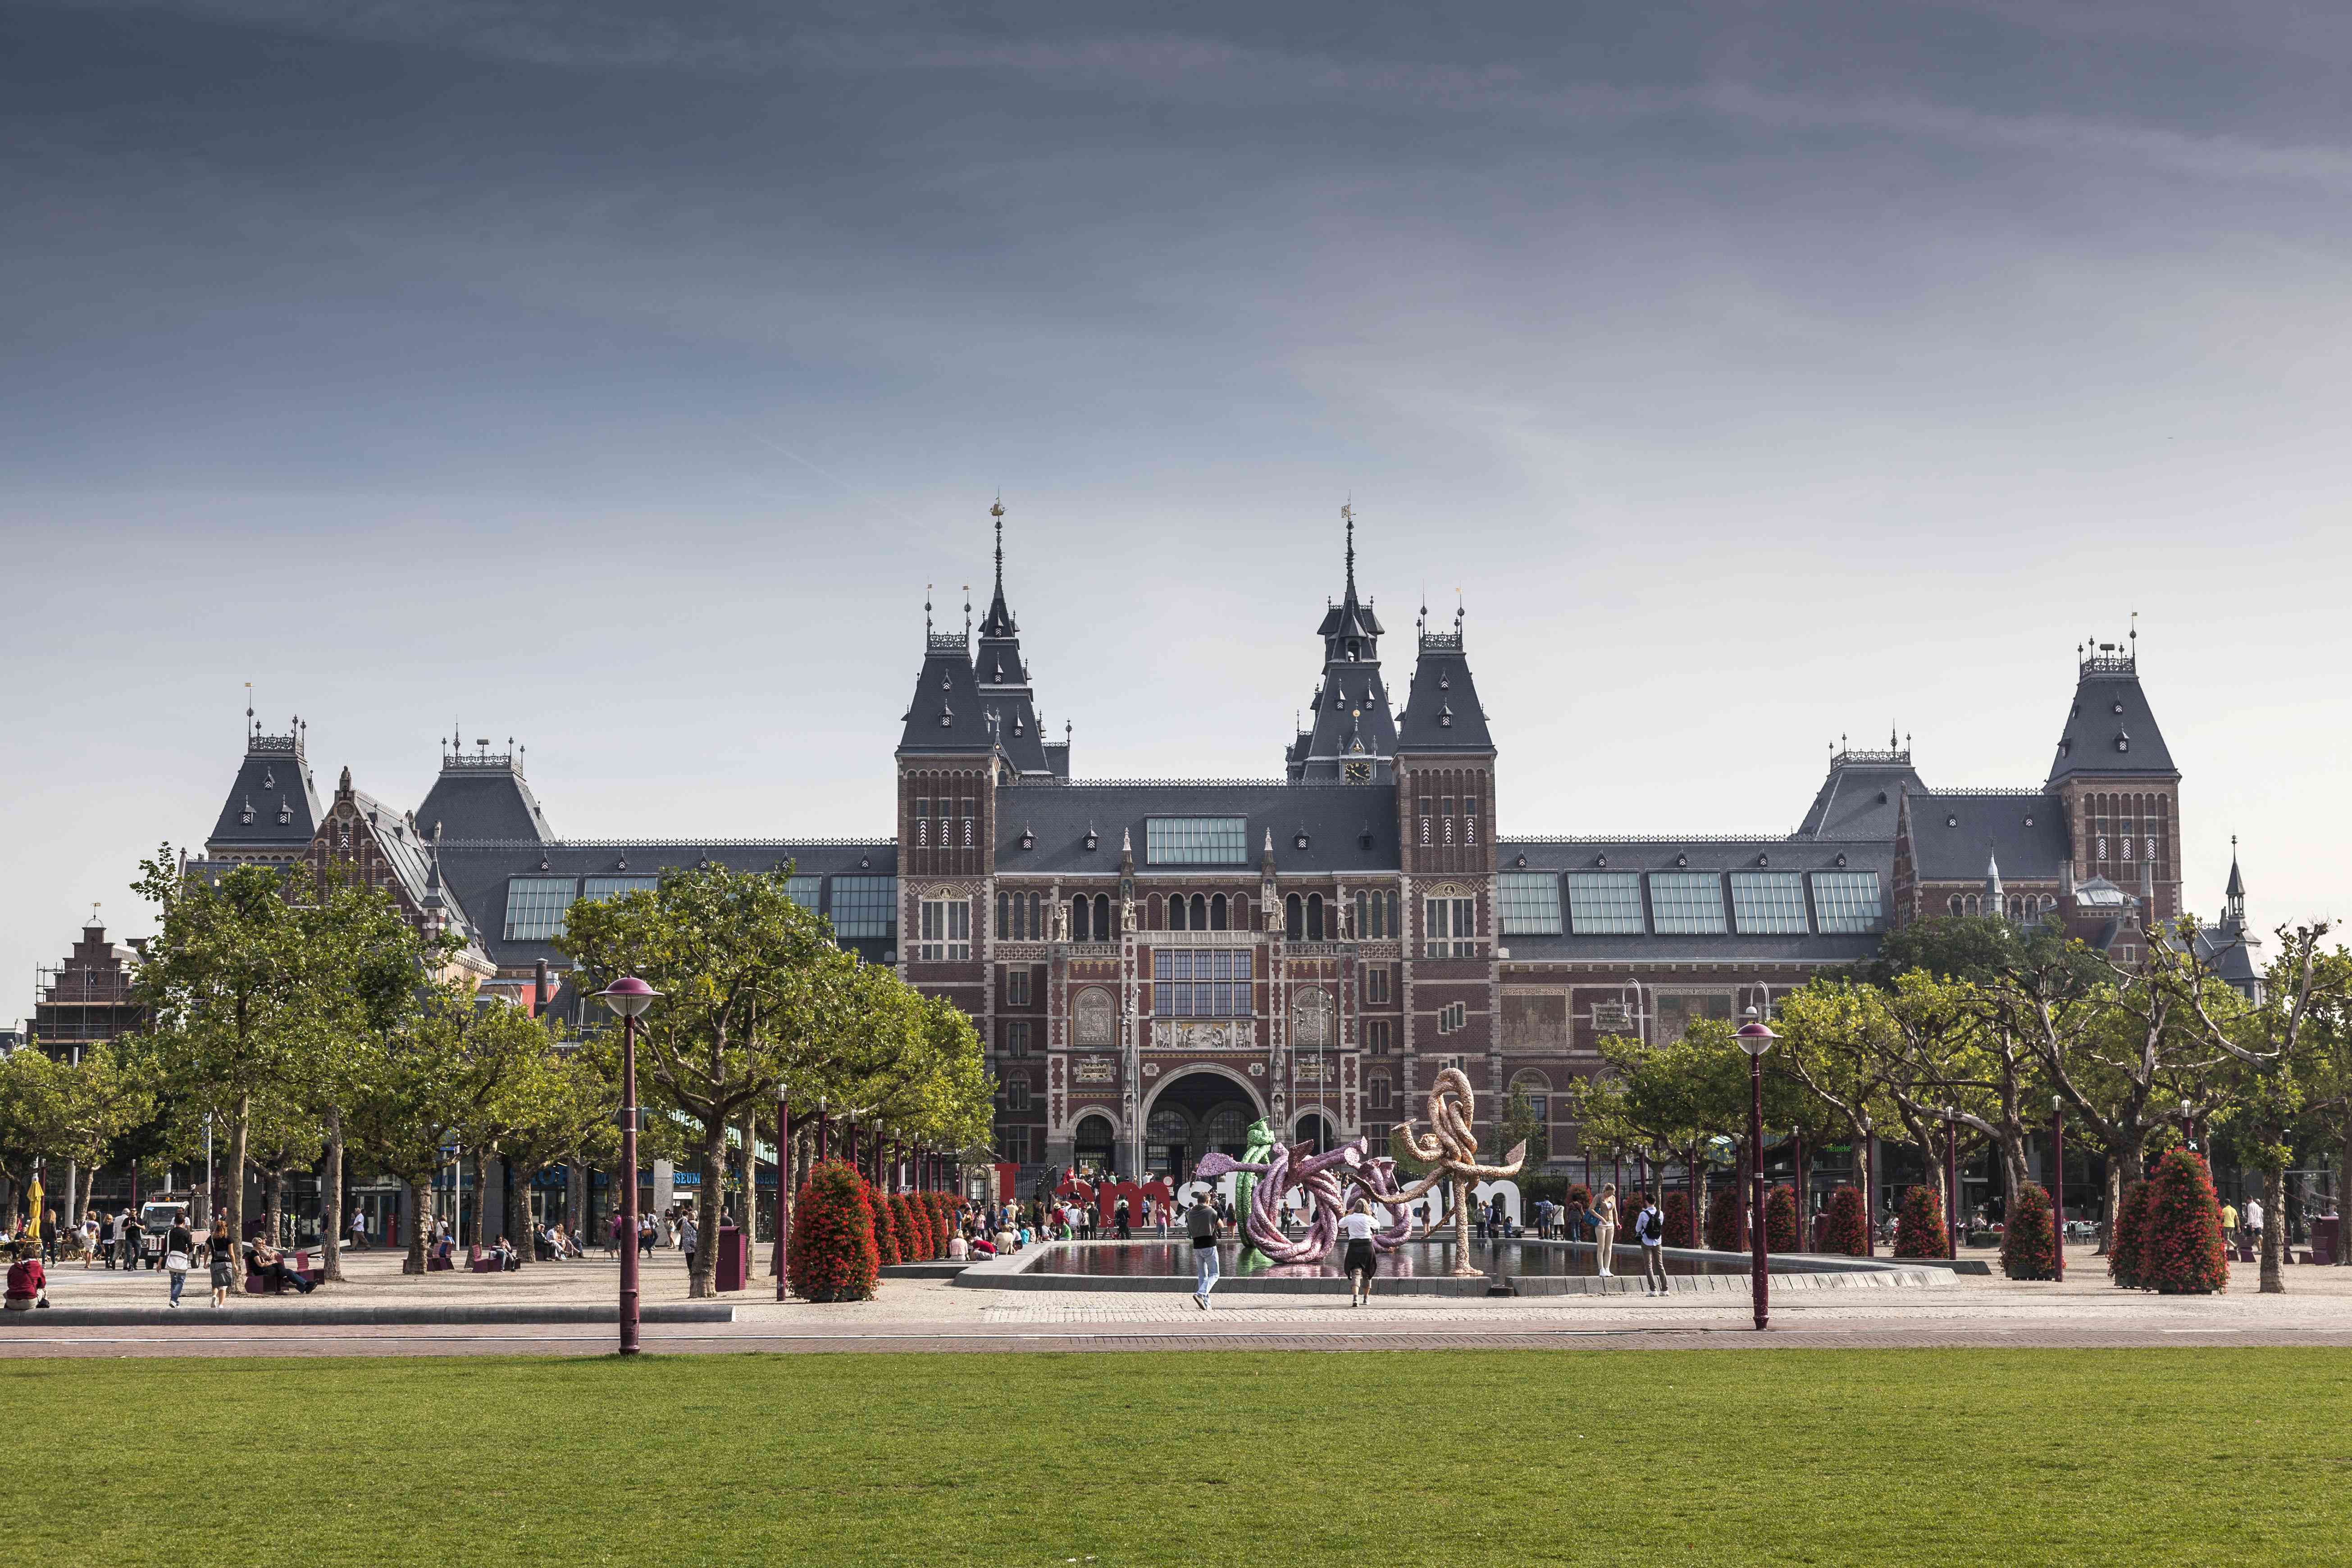 Rijksmuseum. Amsterdam, Netherlands